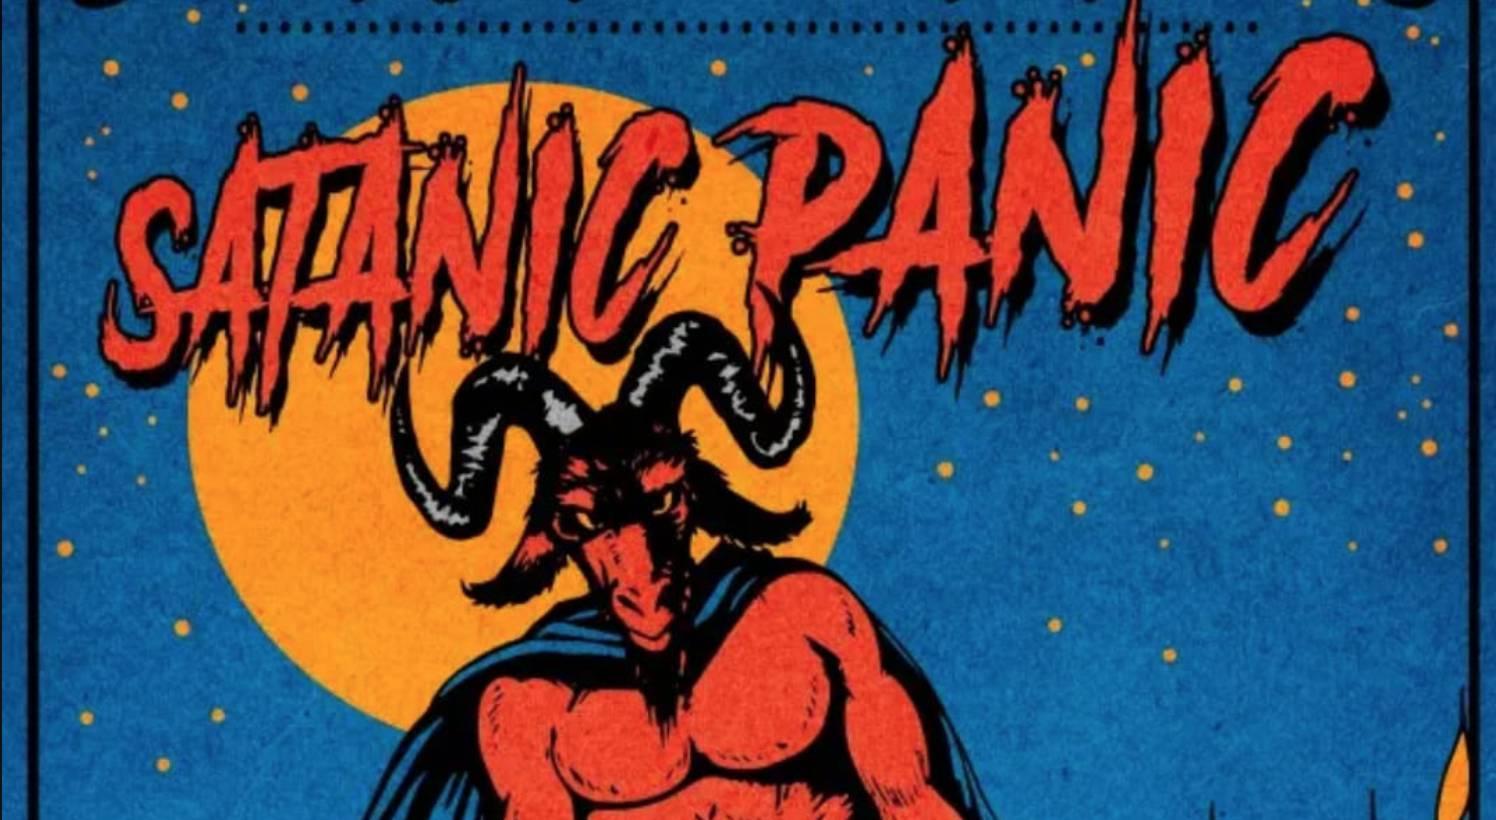 Public 80's Satanic Panic Halloween Party